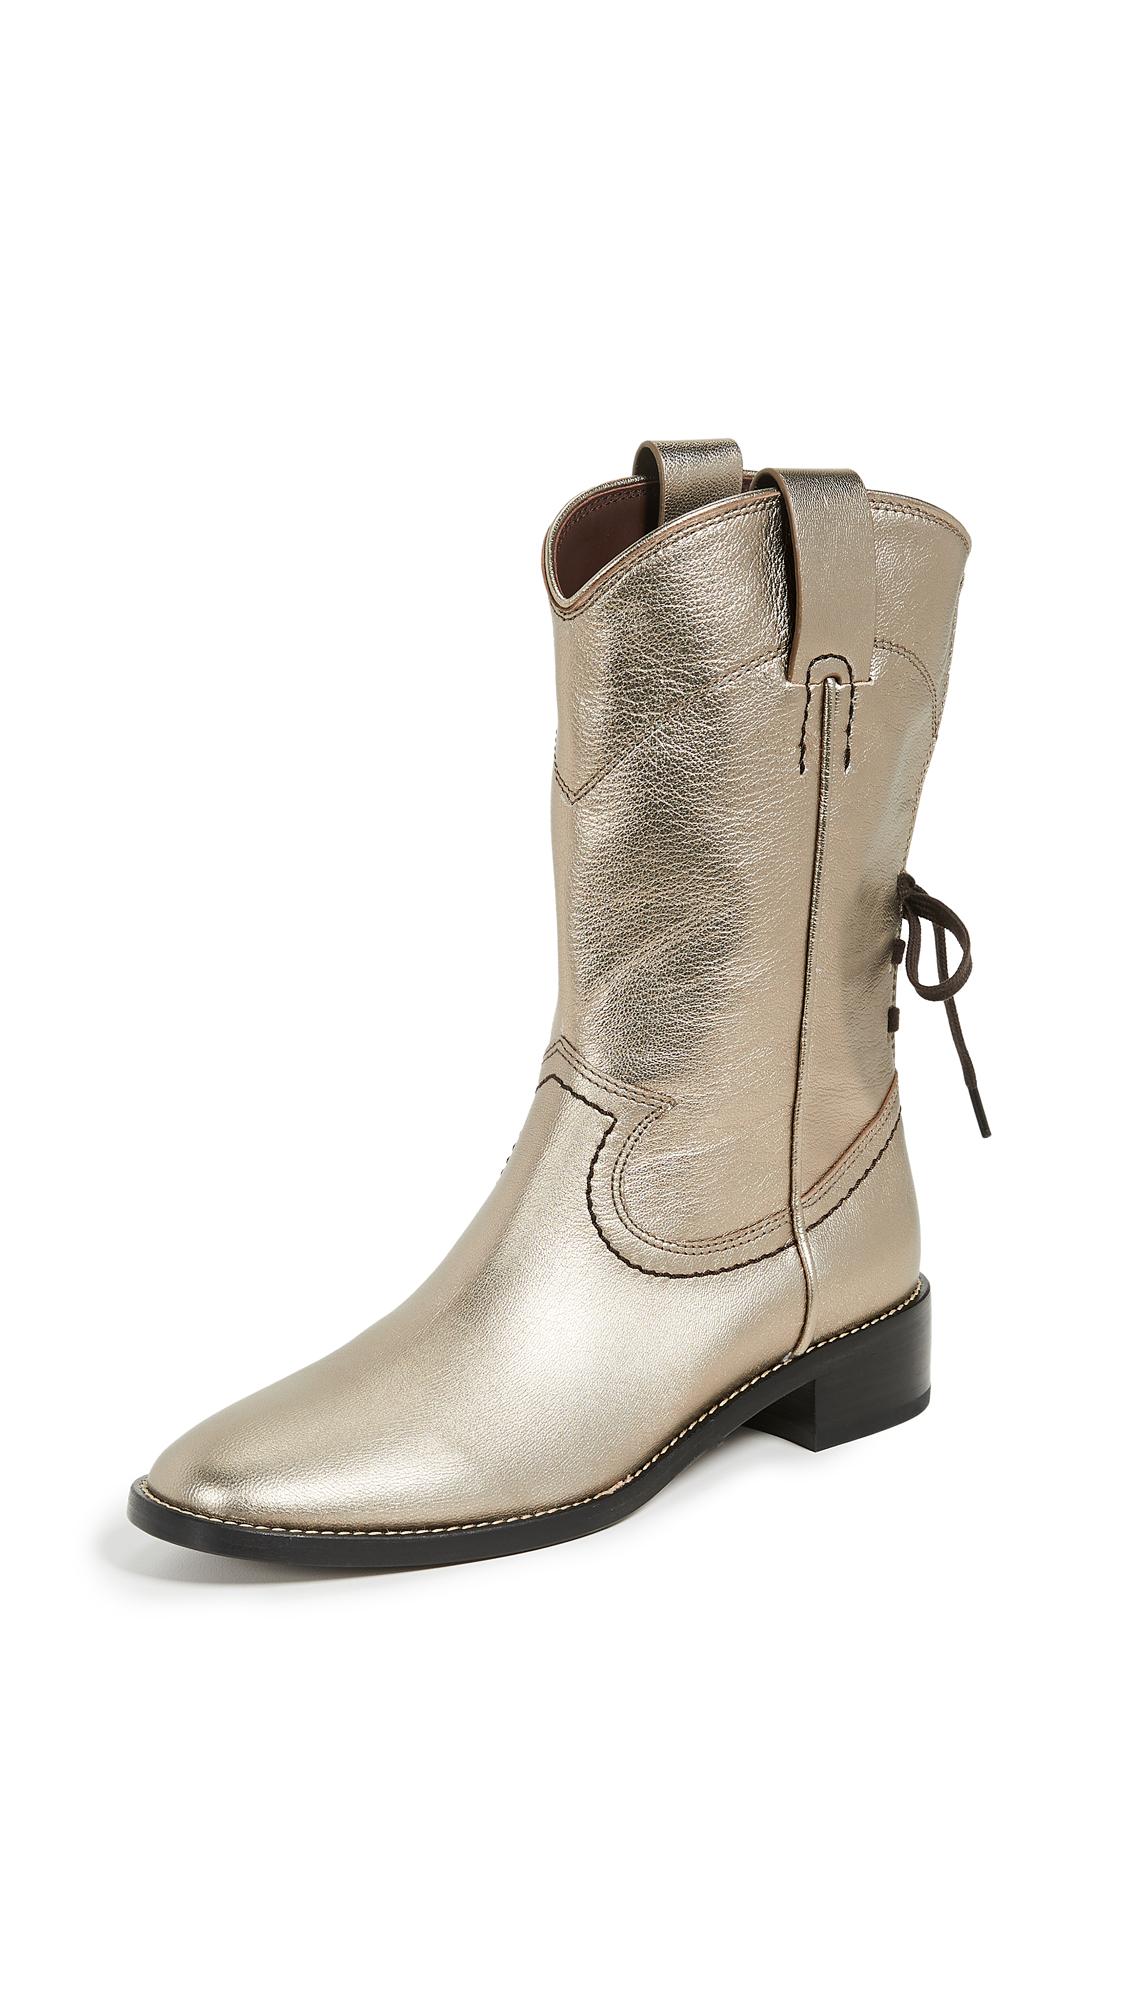 See by Chloe Annika Western Boots - Acciaio